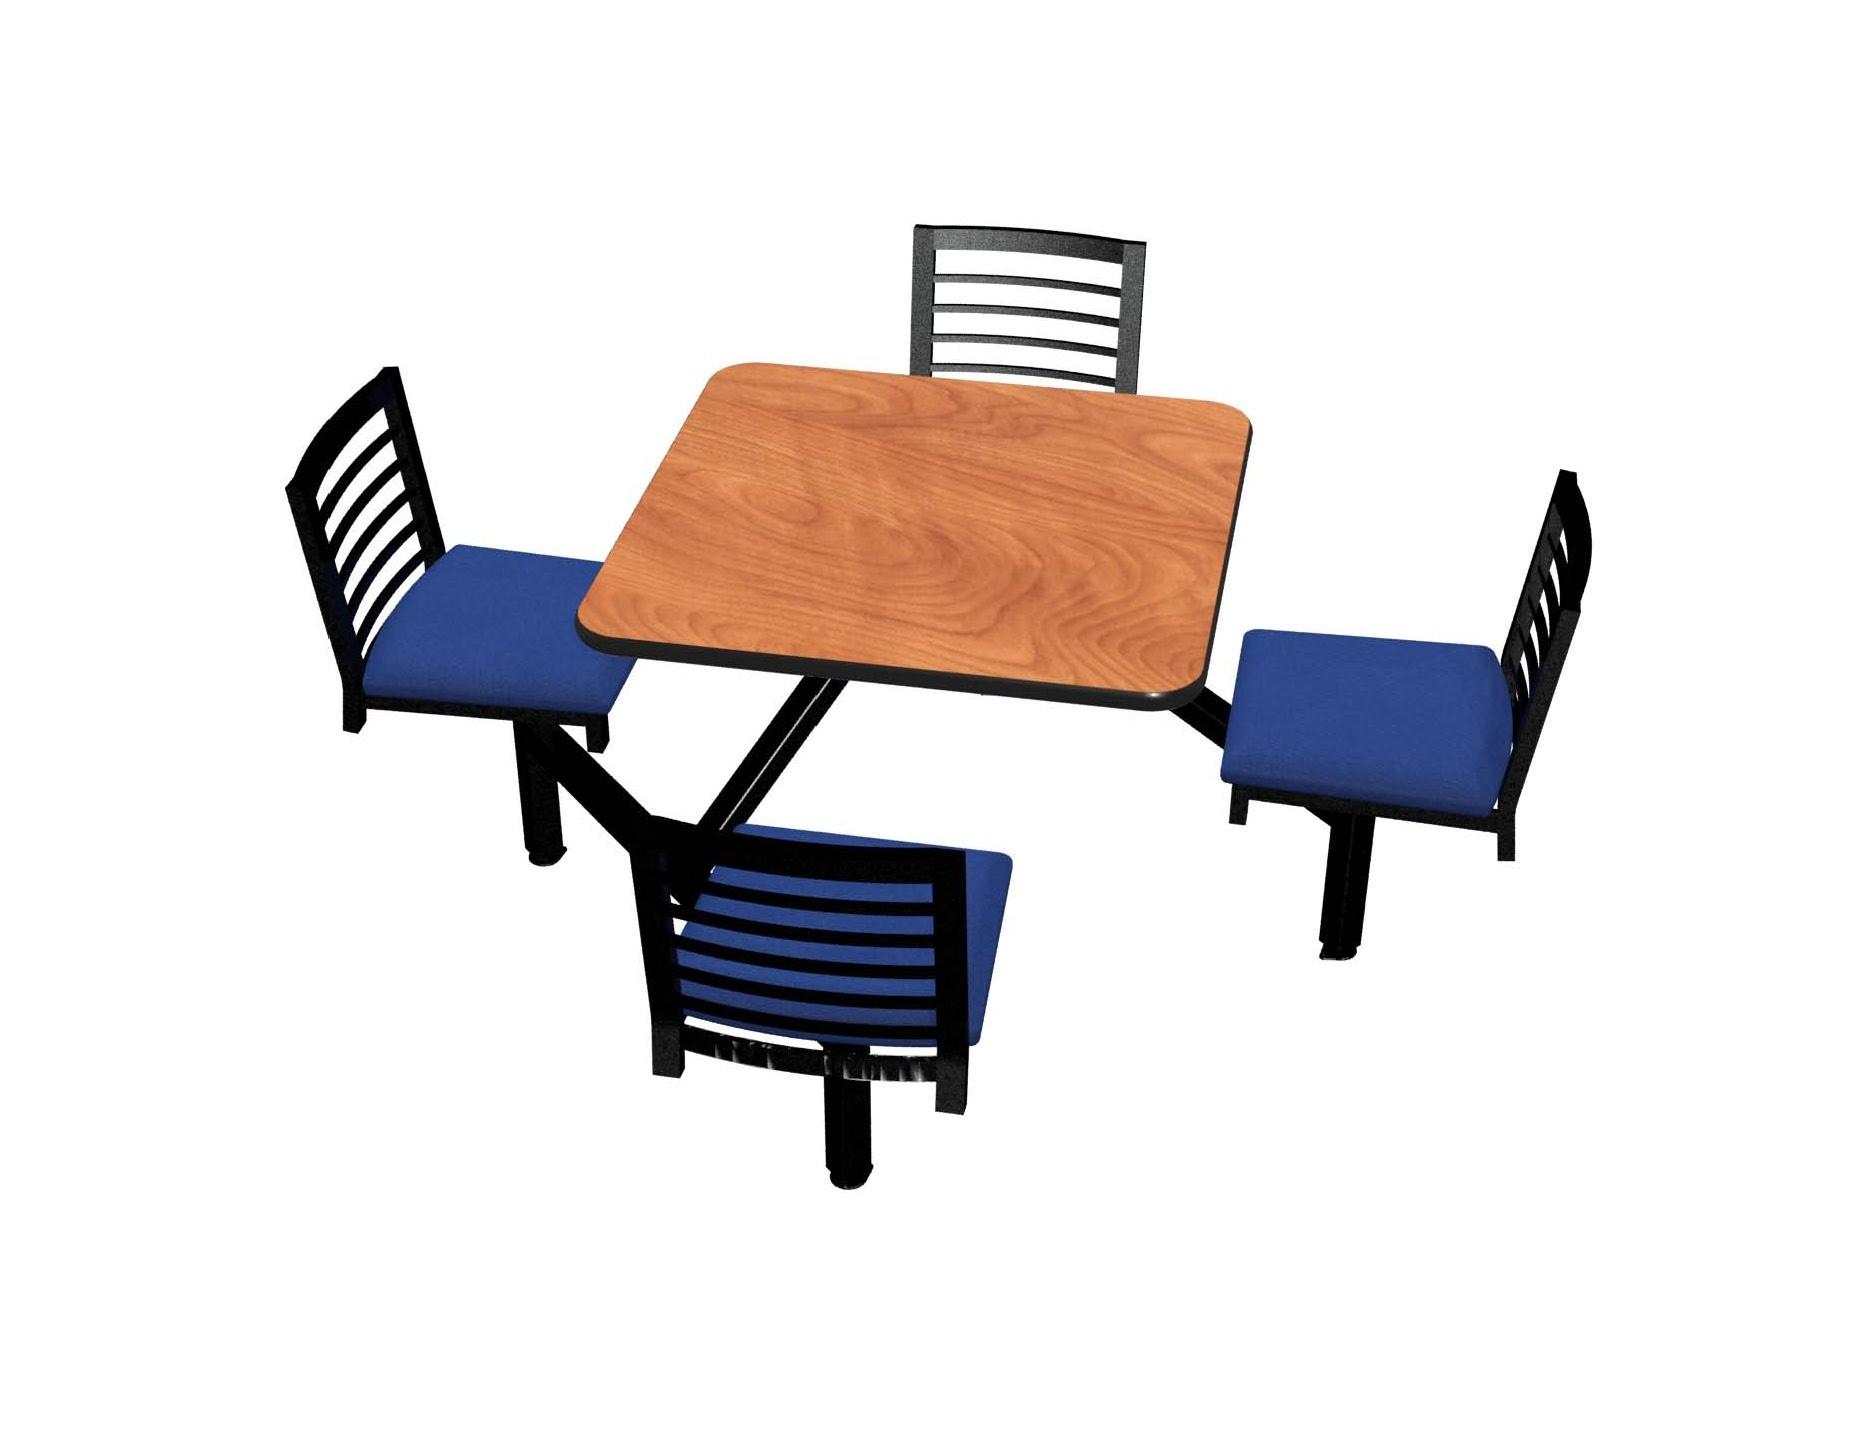 Wild Cherry laminate, Black vinyl edge, Latitude chairhead with Bluejay seat